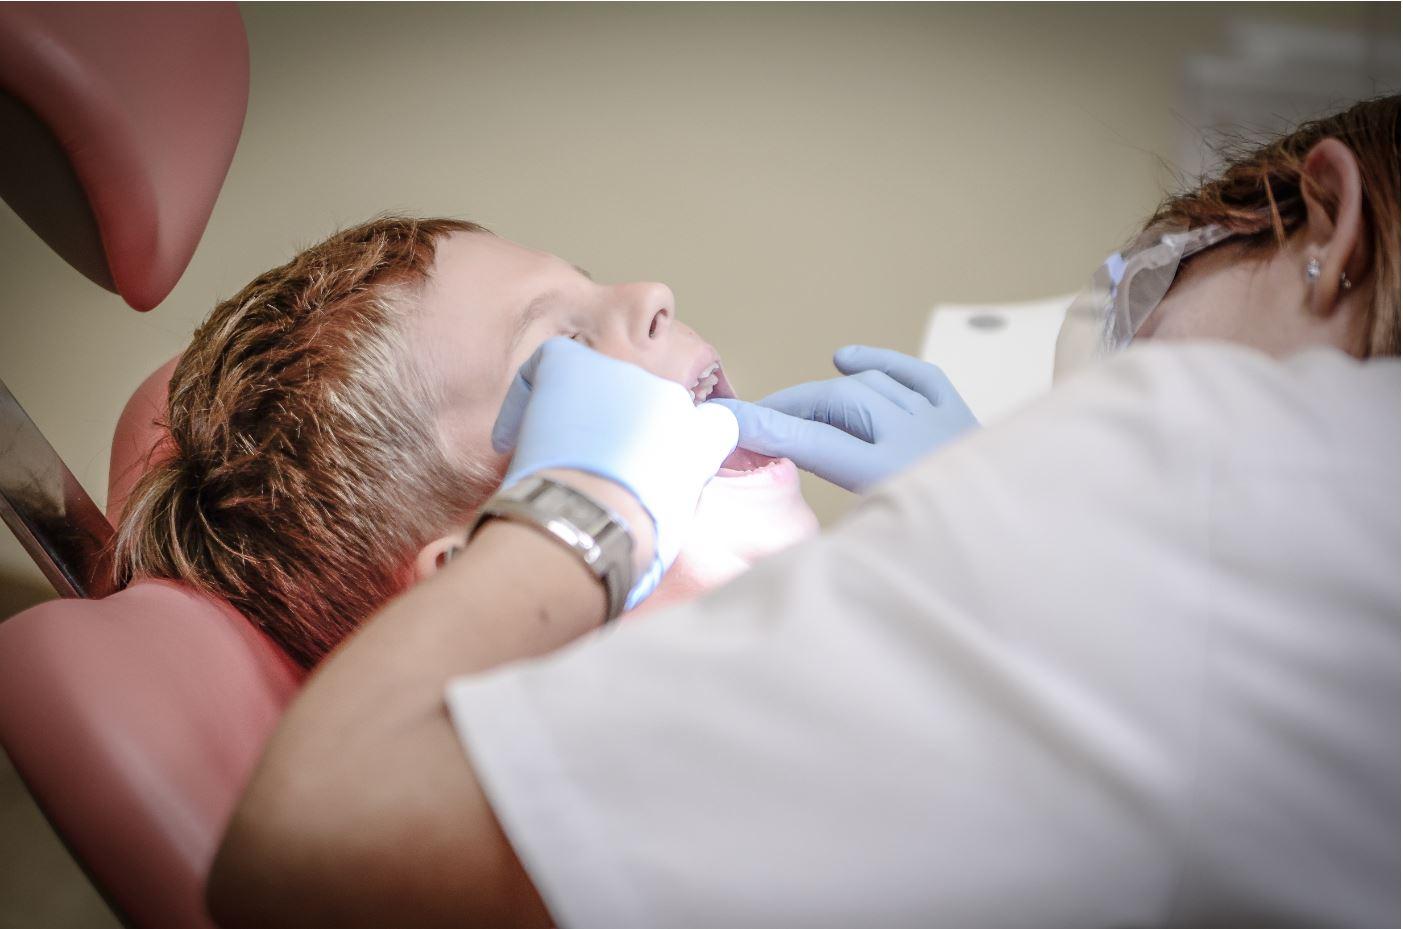 Boy Getting A Dental Check Up